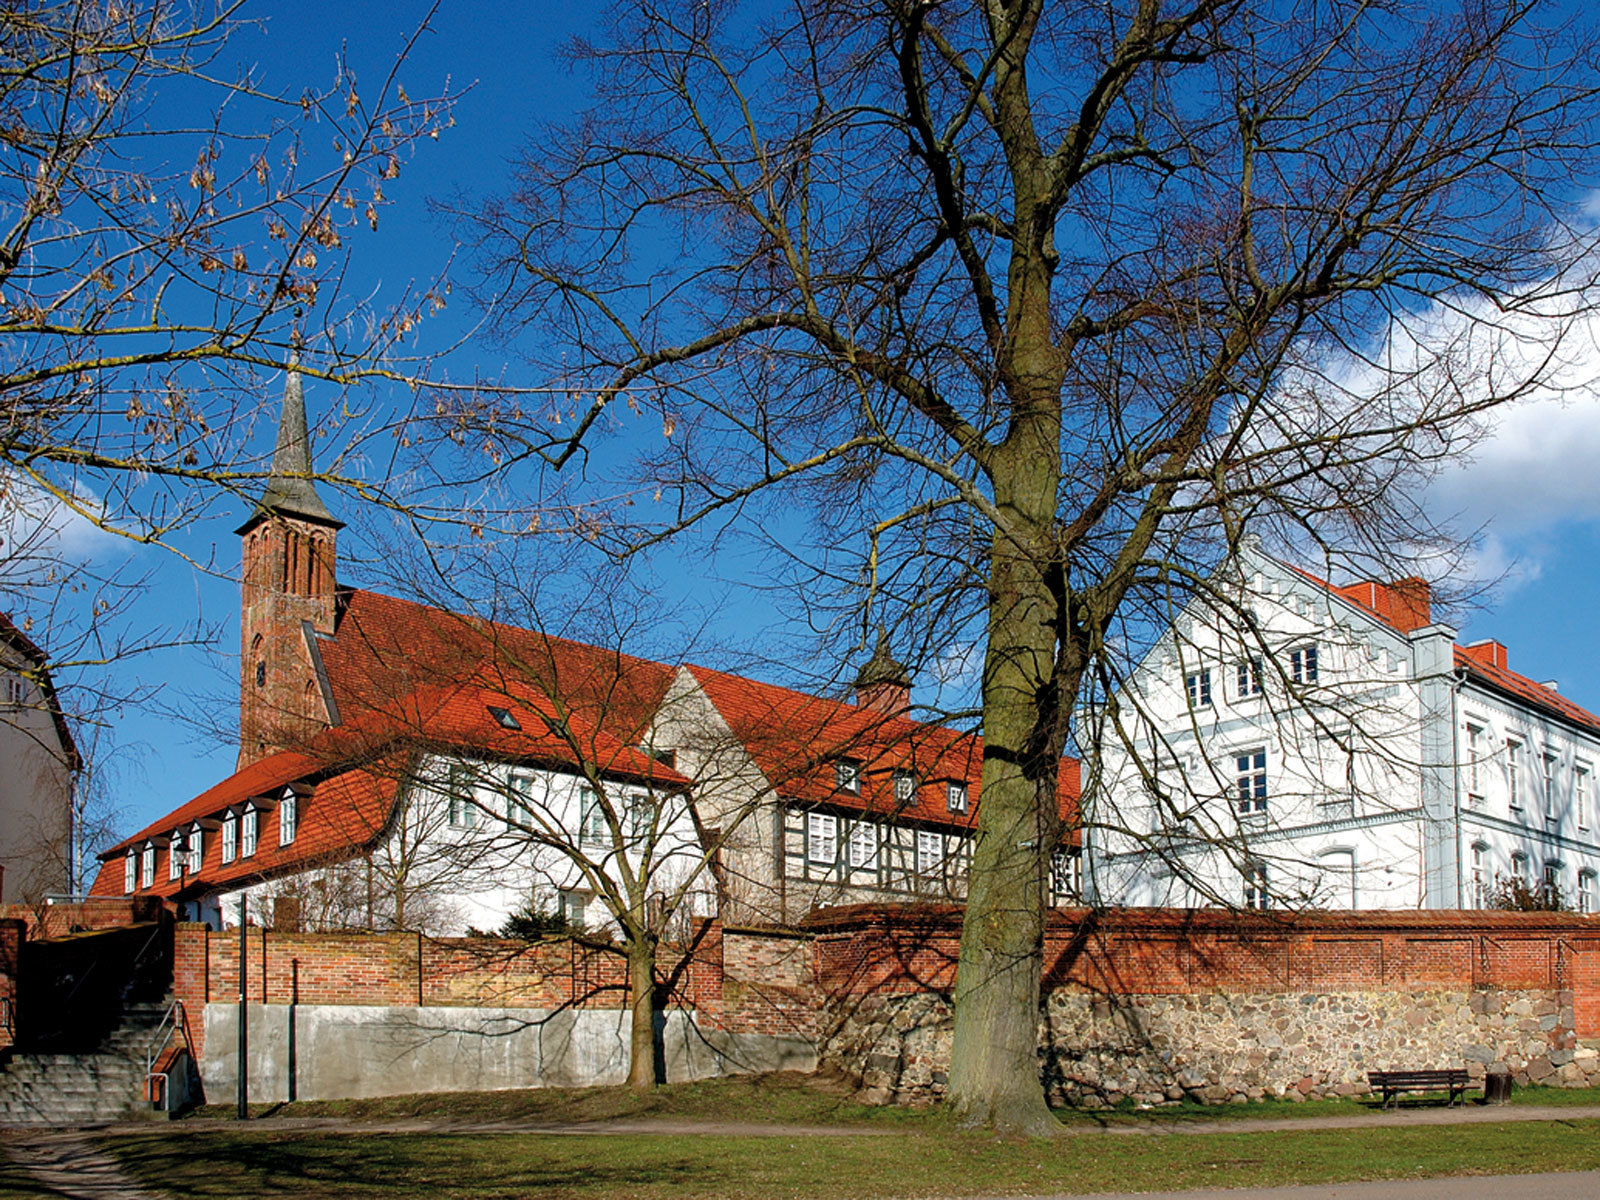 Galerie im Kloster Ribnitz